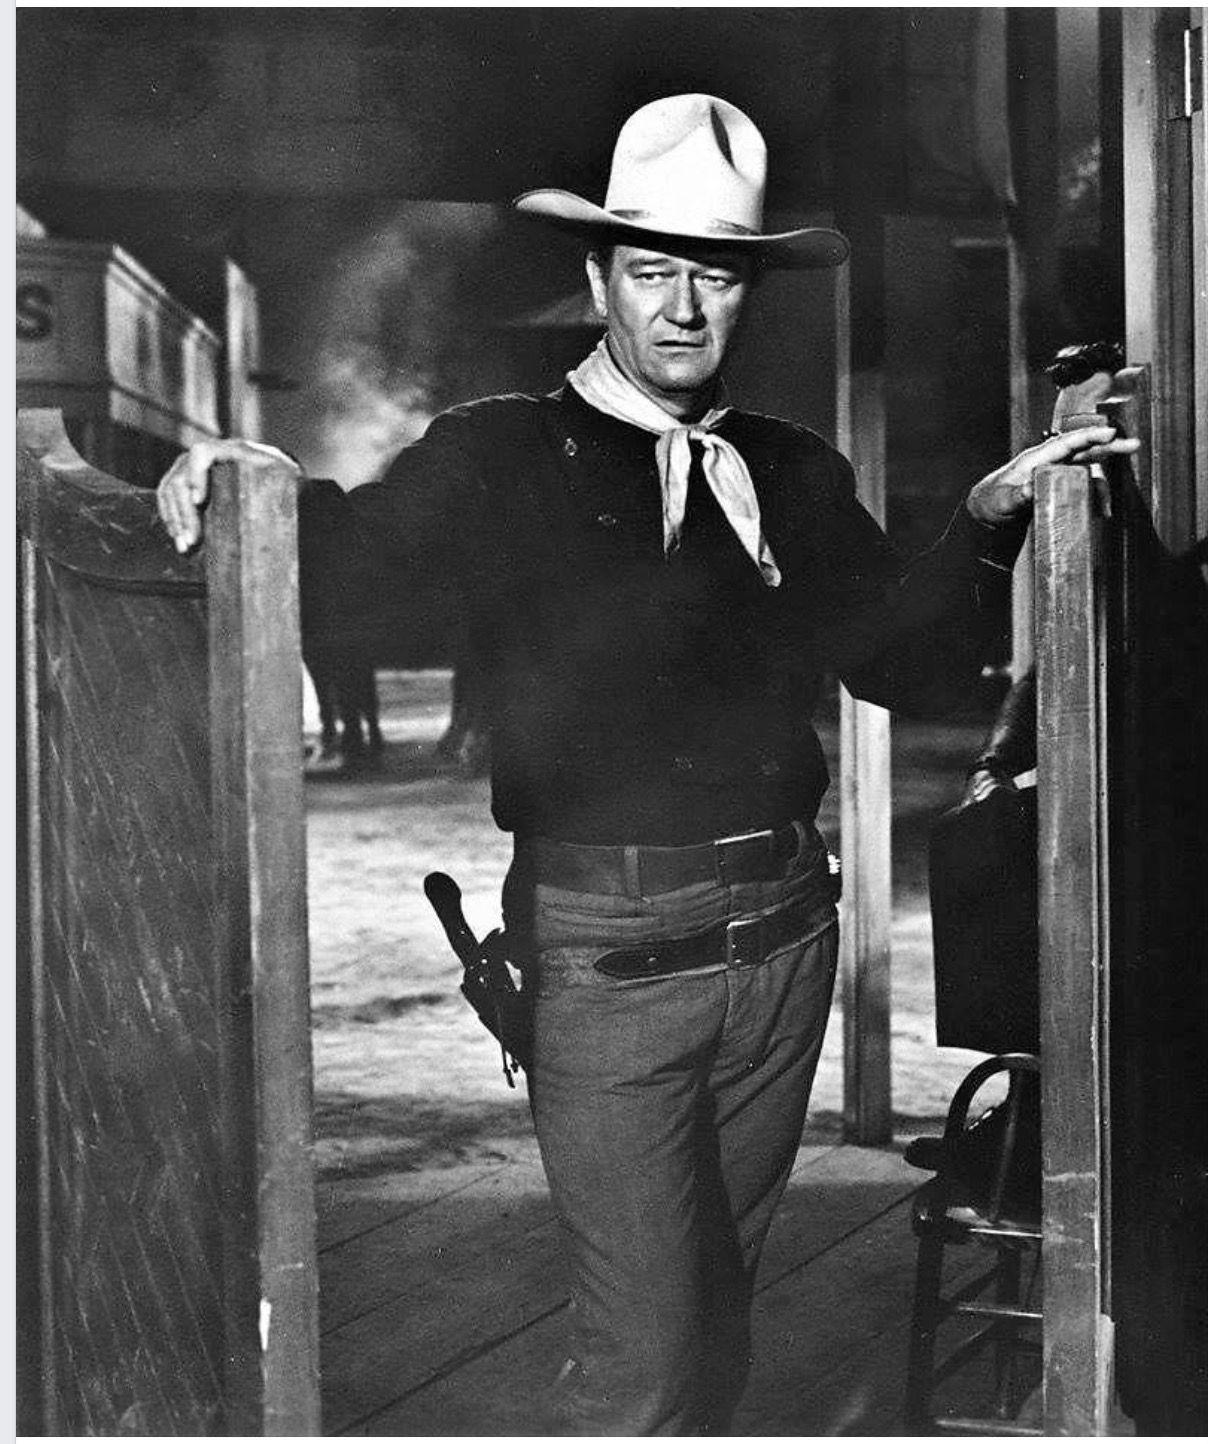 Tom Doniphon - The Man Who Shot Liberty Valance